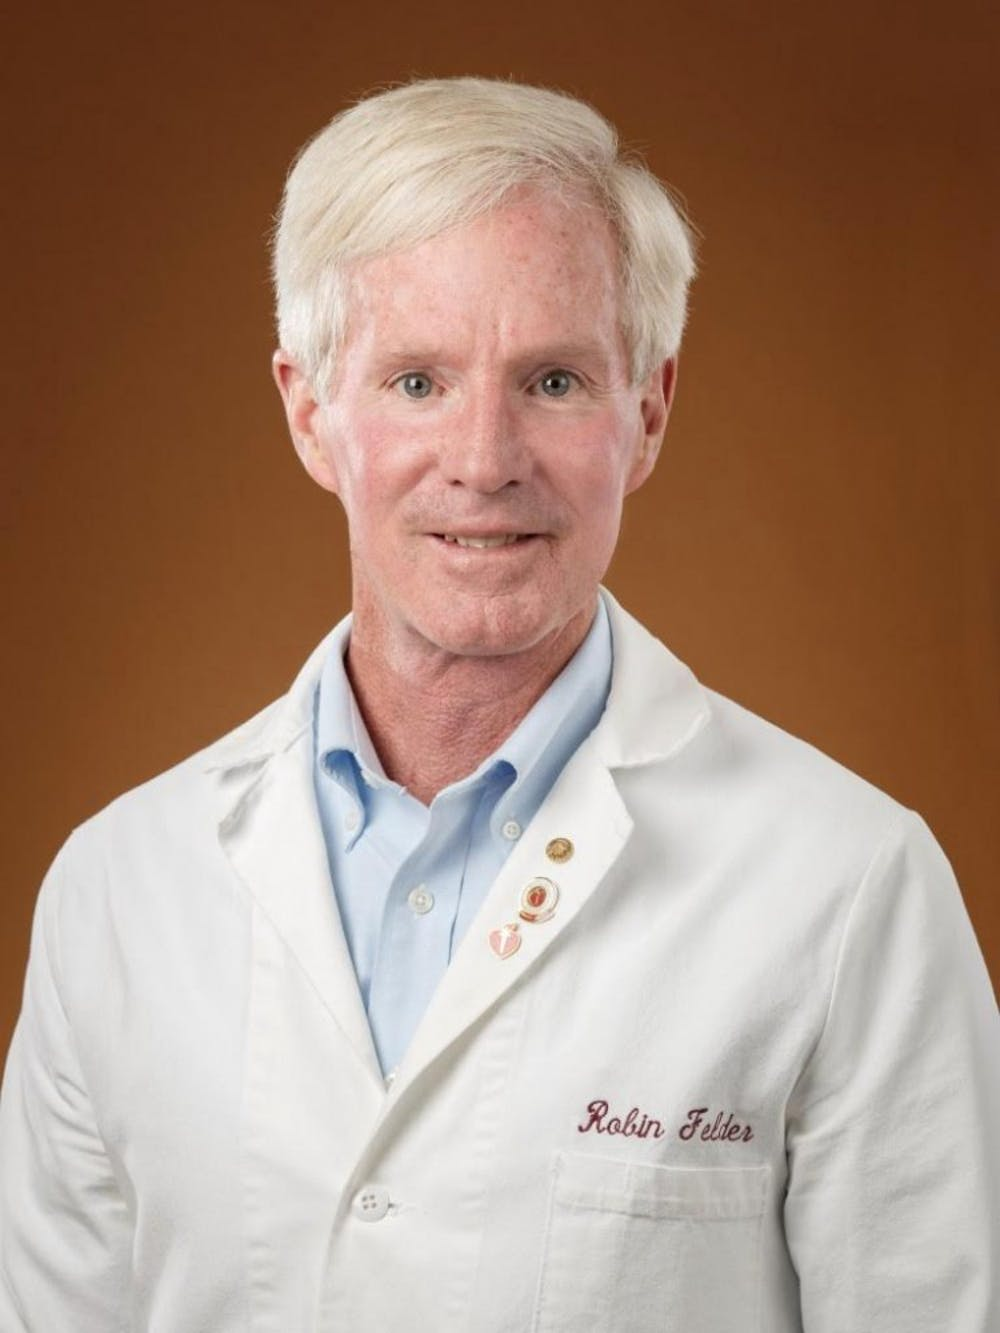 hs-robinfeldersaltstudy-courtesyuvamedicalschool